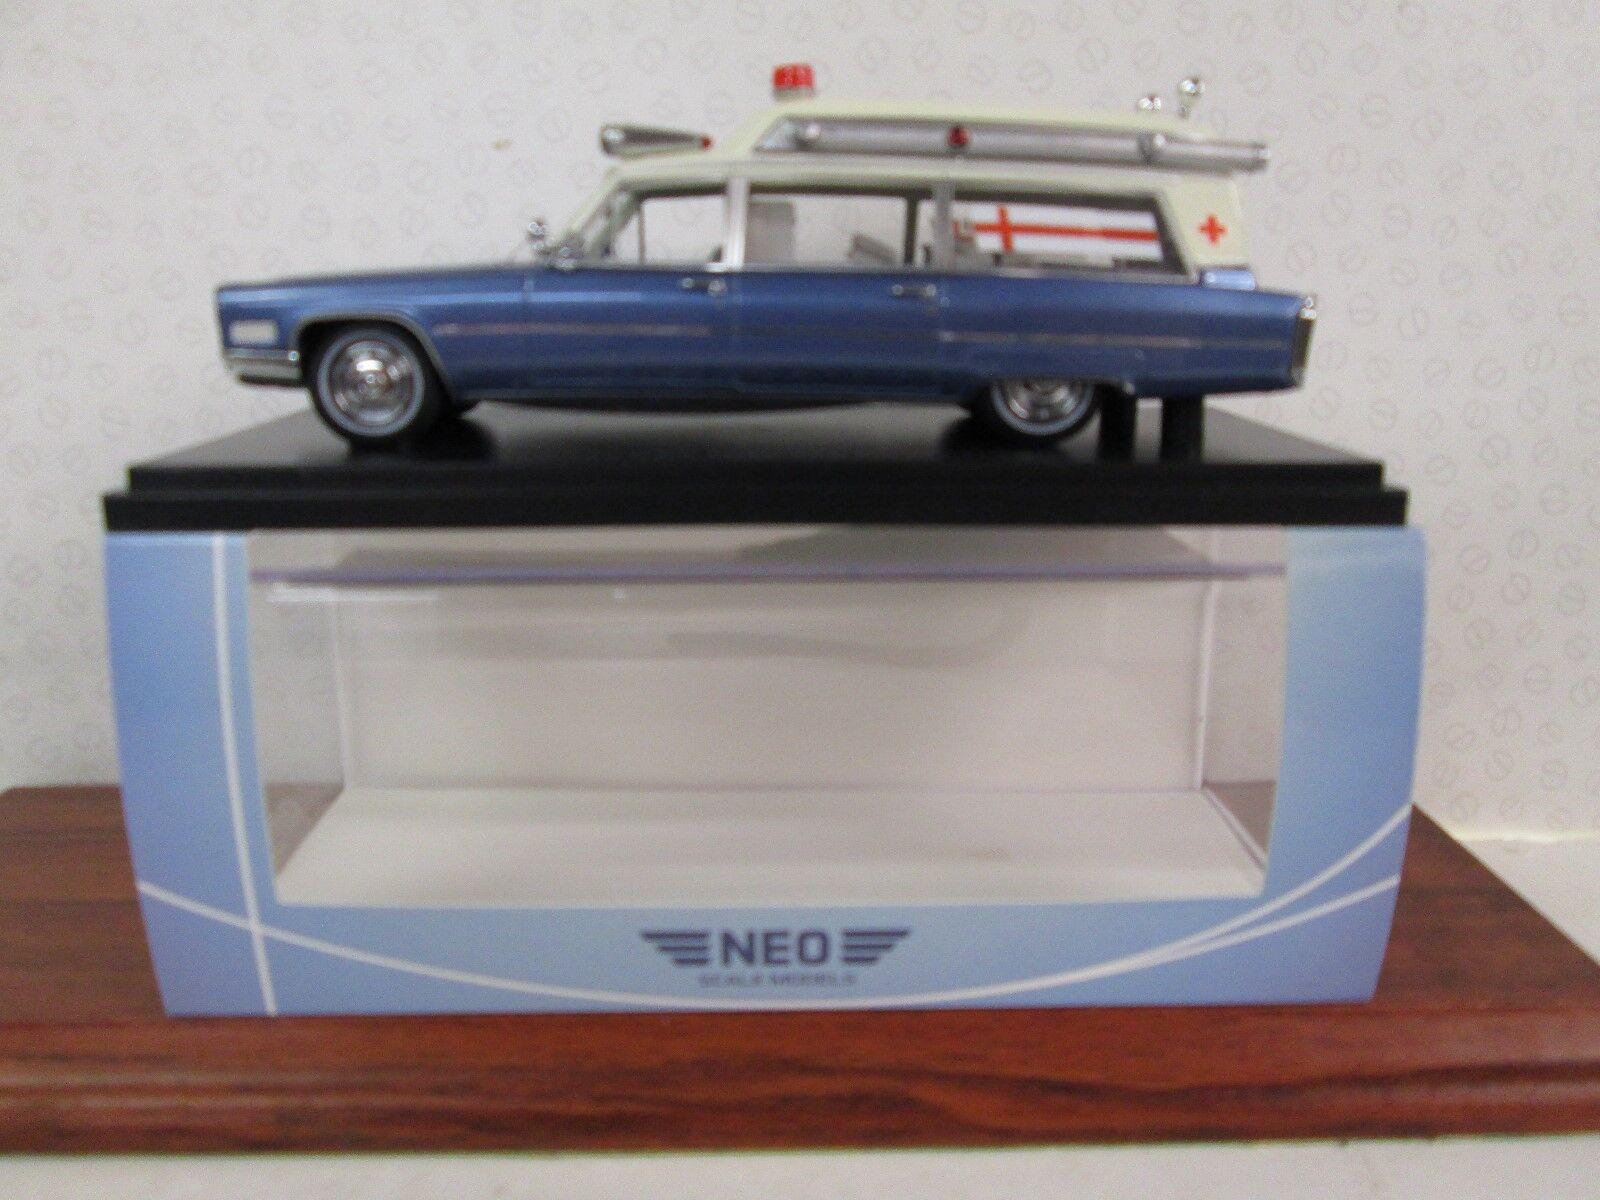 NEO. Cadillac S&S High Top  Ambulance. Weiß Metallic Blau 1 43 Scale. NEO49545